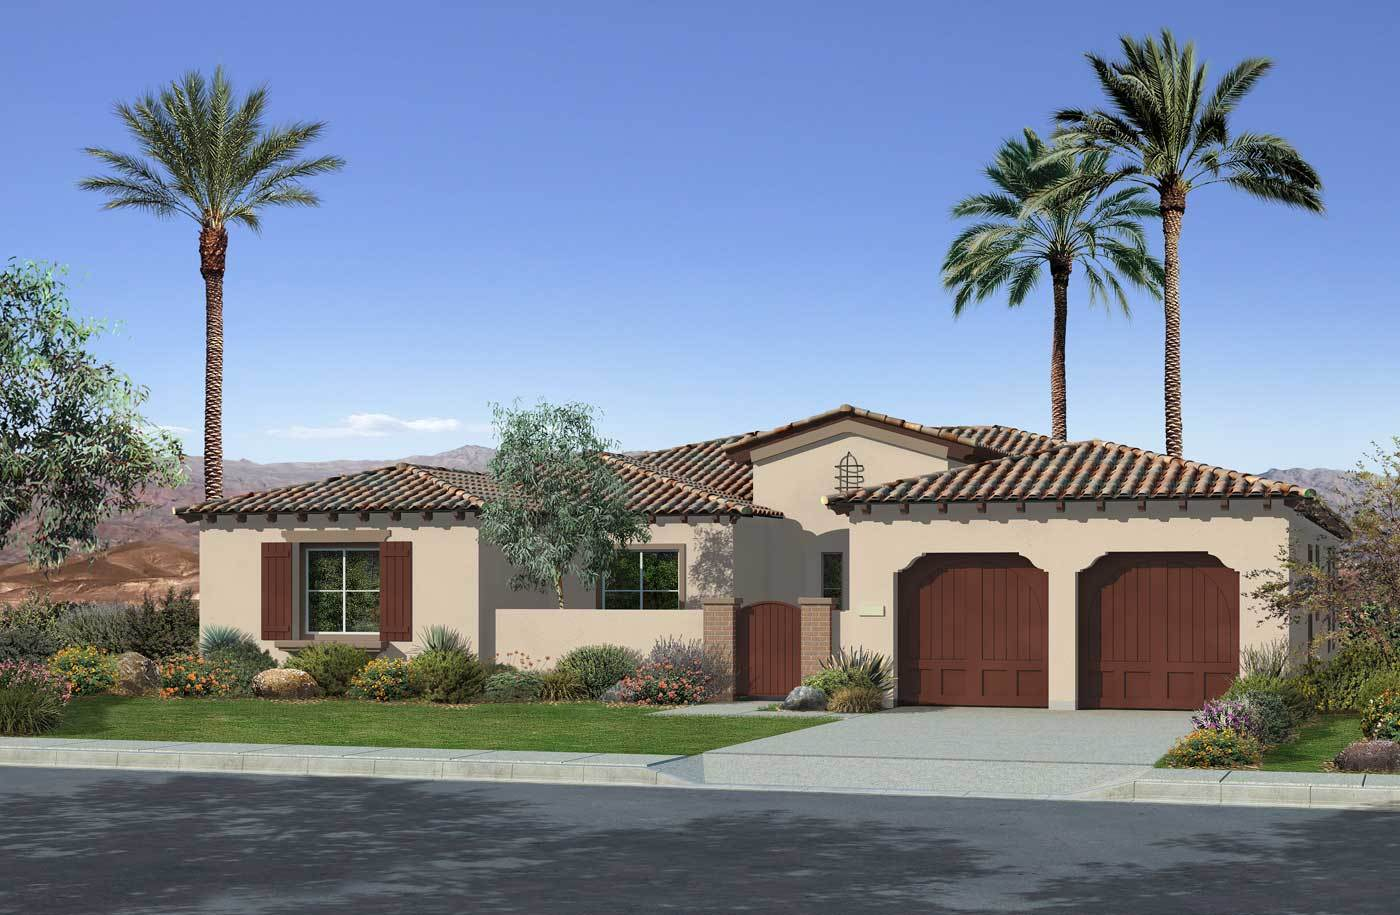 palm desert homes for sale homes for sale in palm desert ca homegain